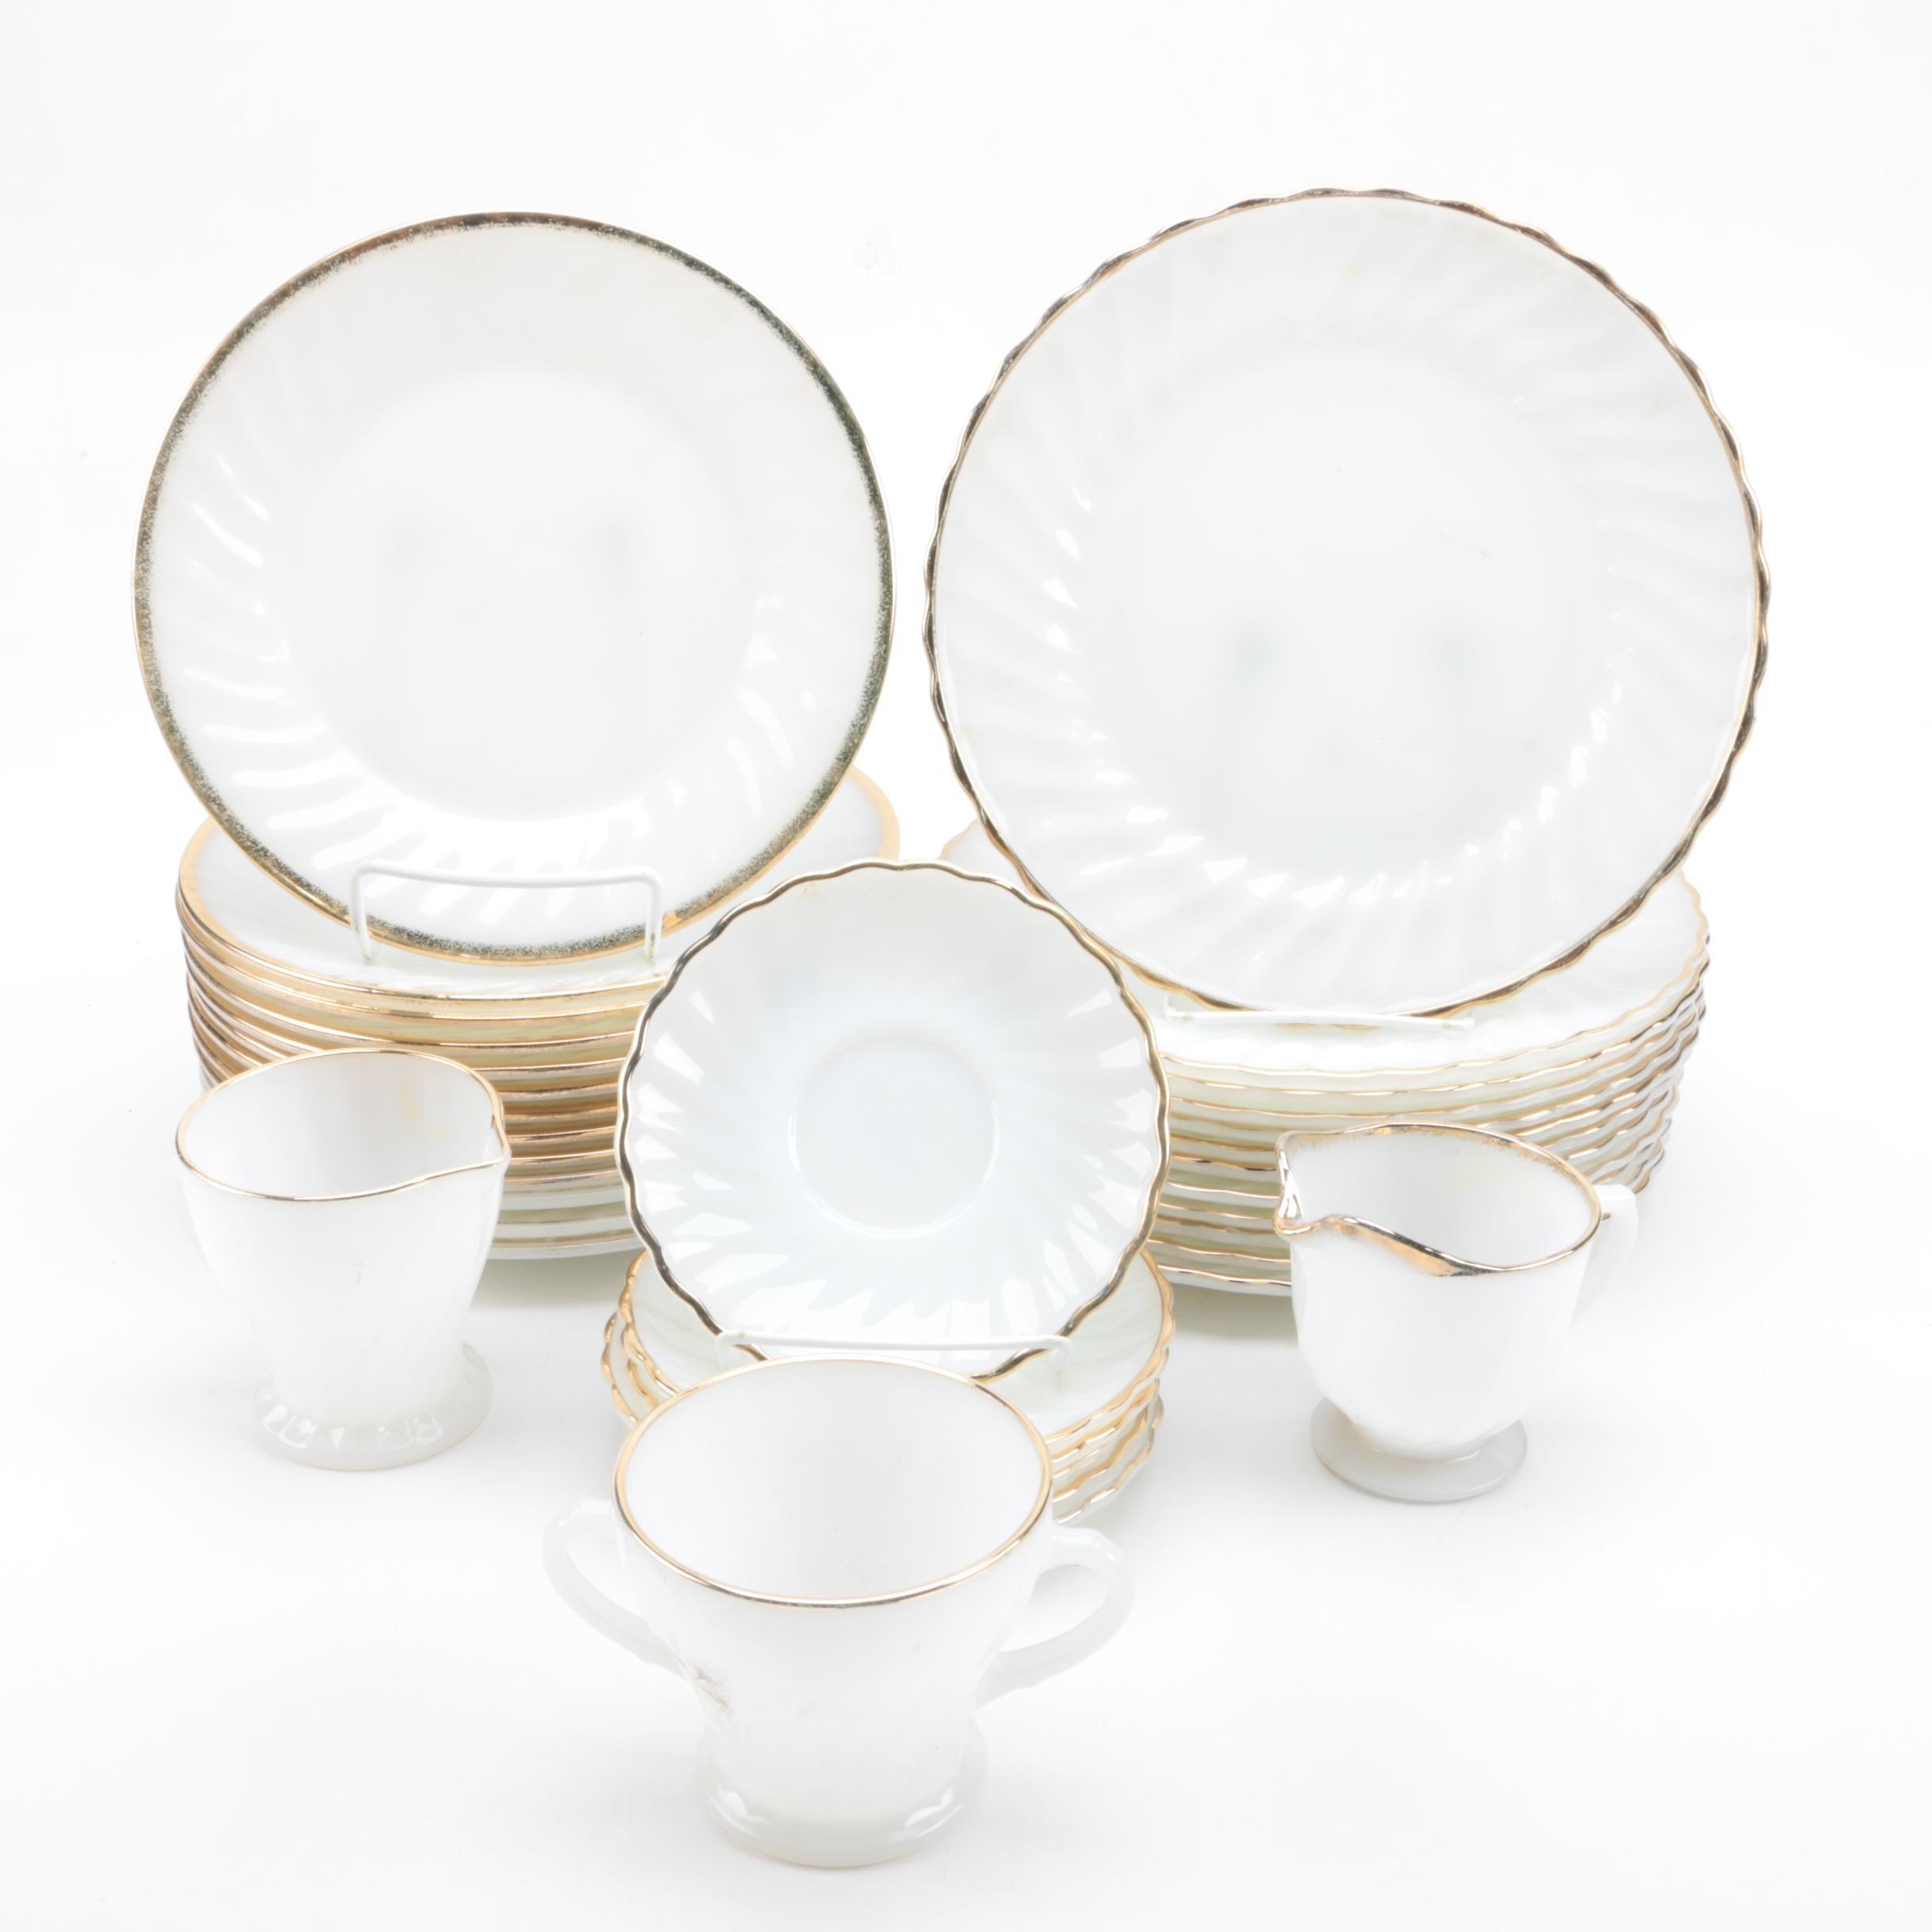 Fire-King Milk Glass Tableware